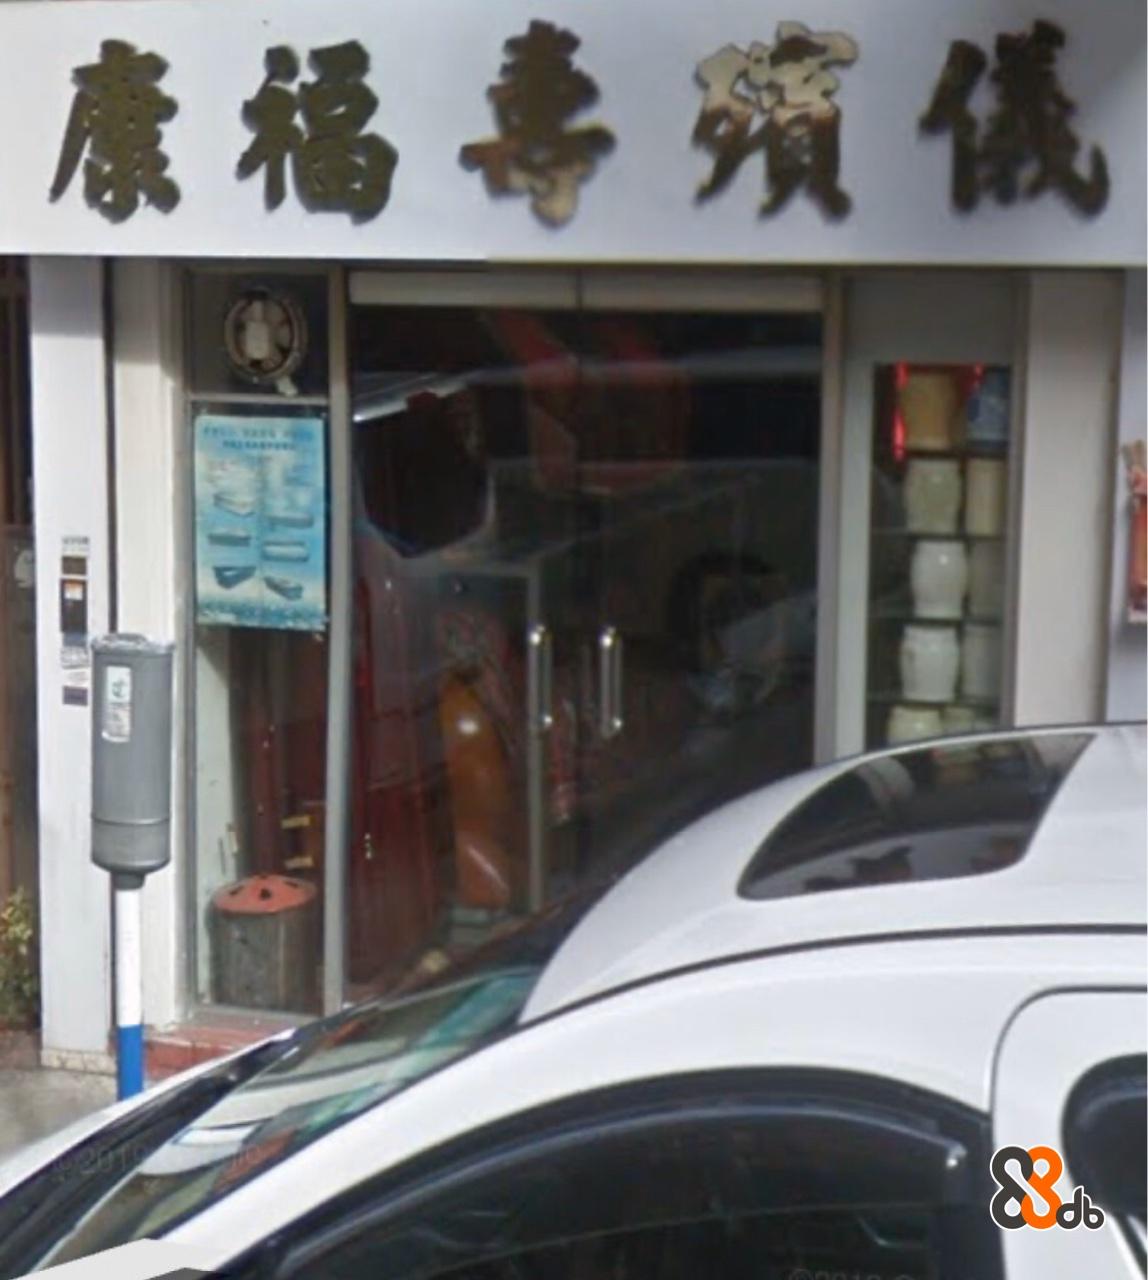 康福壽殯儀  Automotive exterior,Vehicle,Auto part,Car,Automotive window part